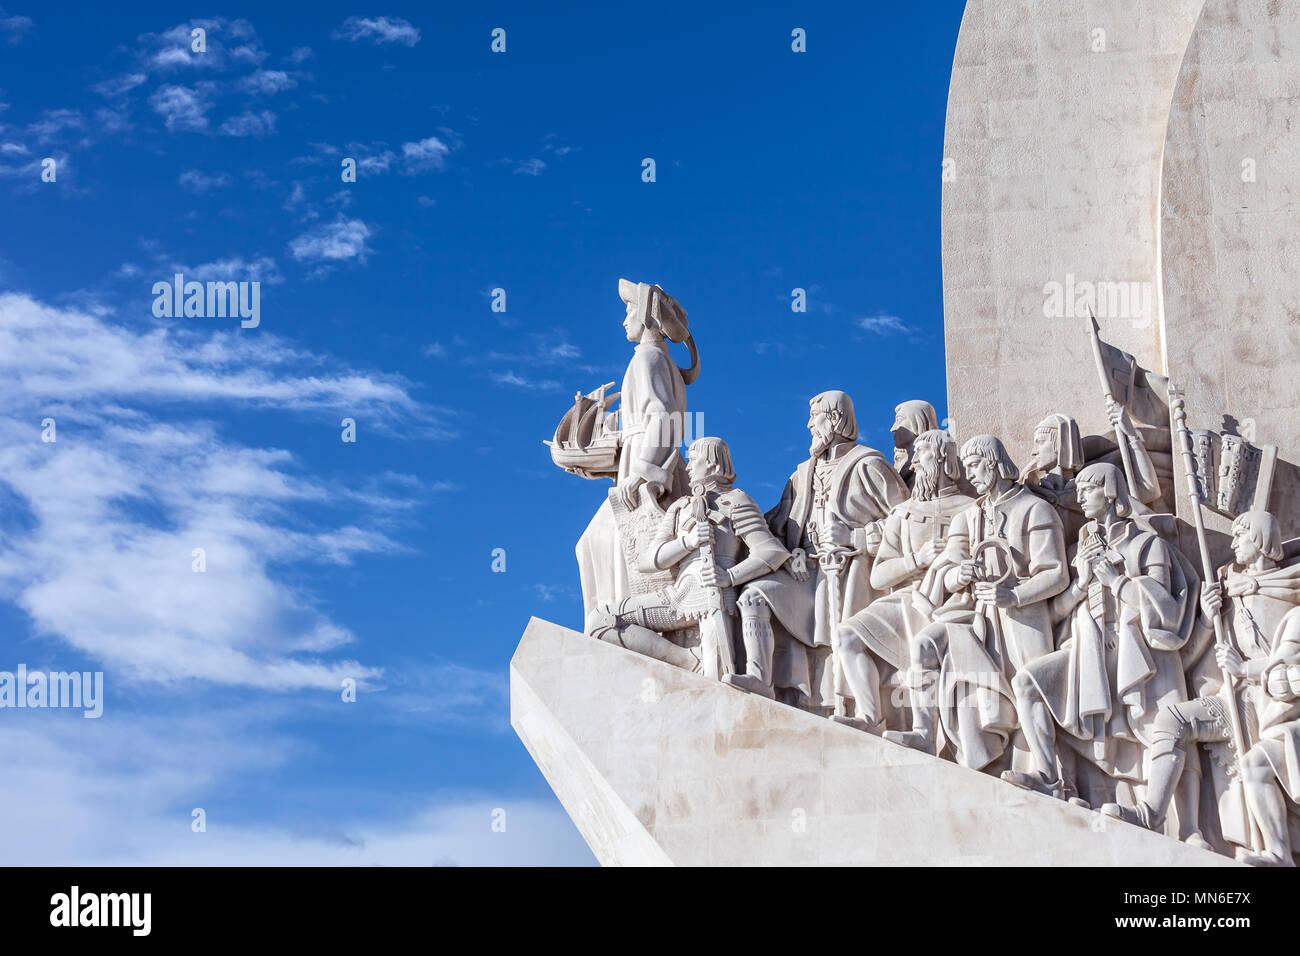 Lisbon, Portugal - February 04, 2018: Padrao dos Descobrimentos monument. The Sea Discoveries Monument commemorates the navigators who explored the oc - Stock Image